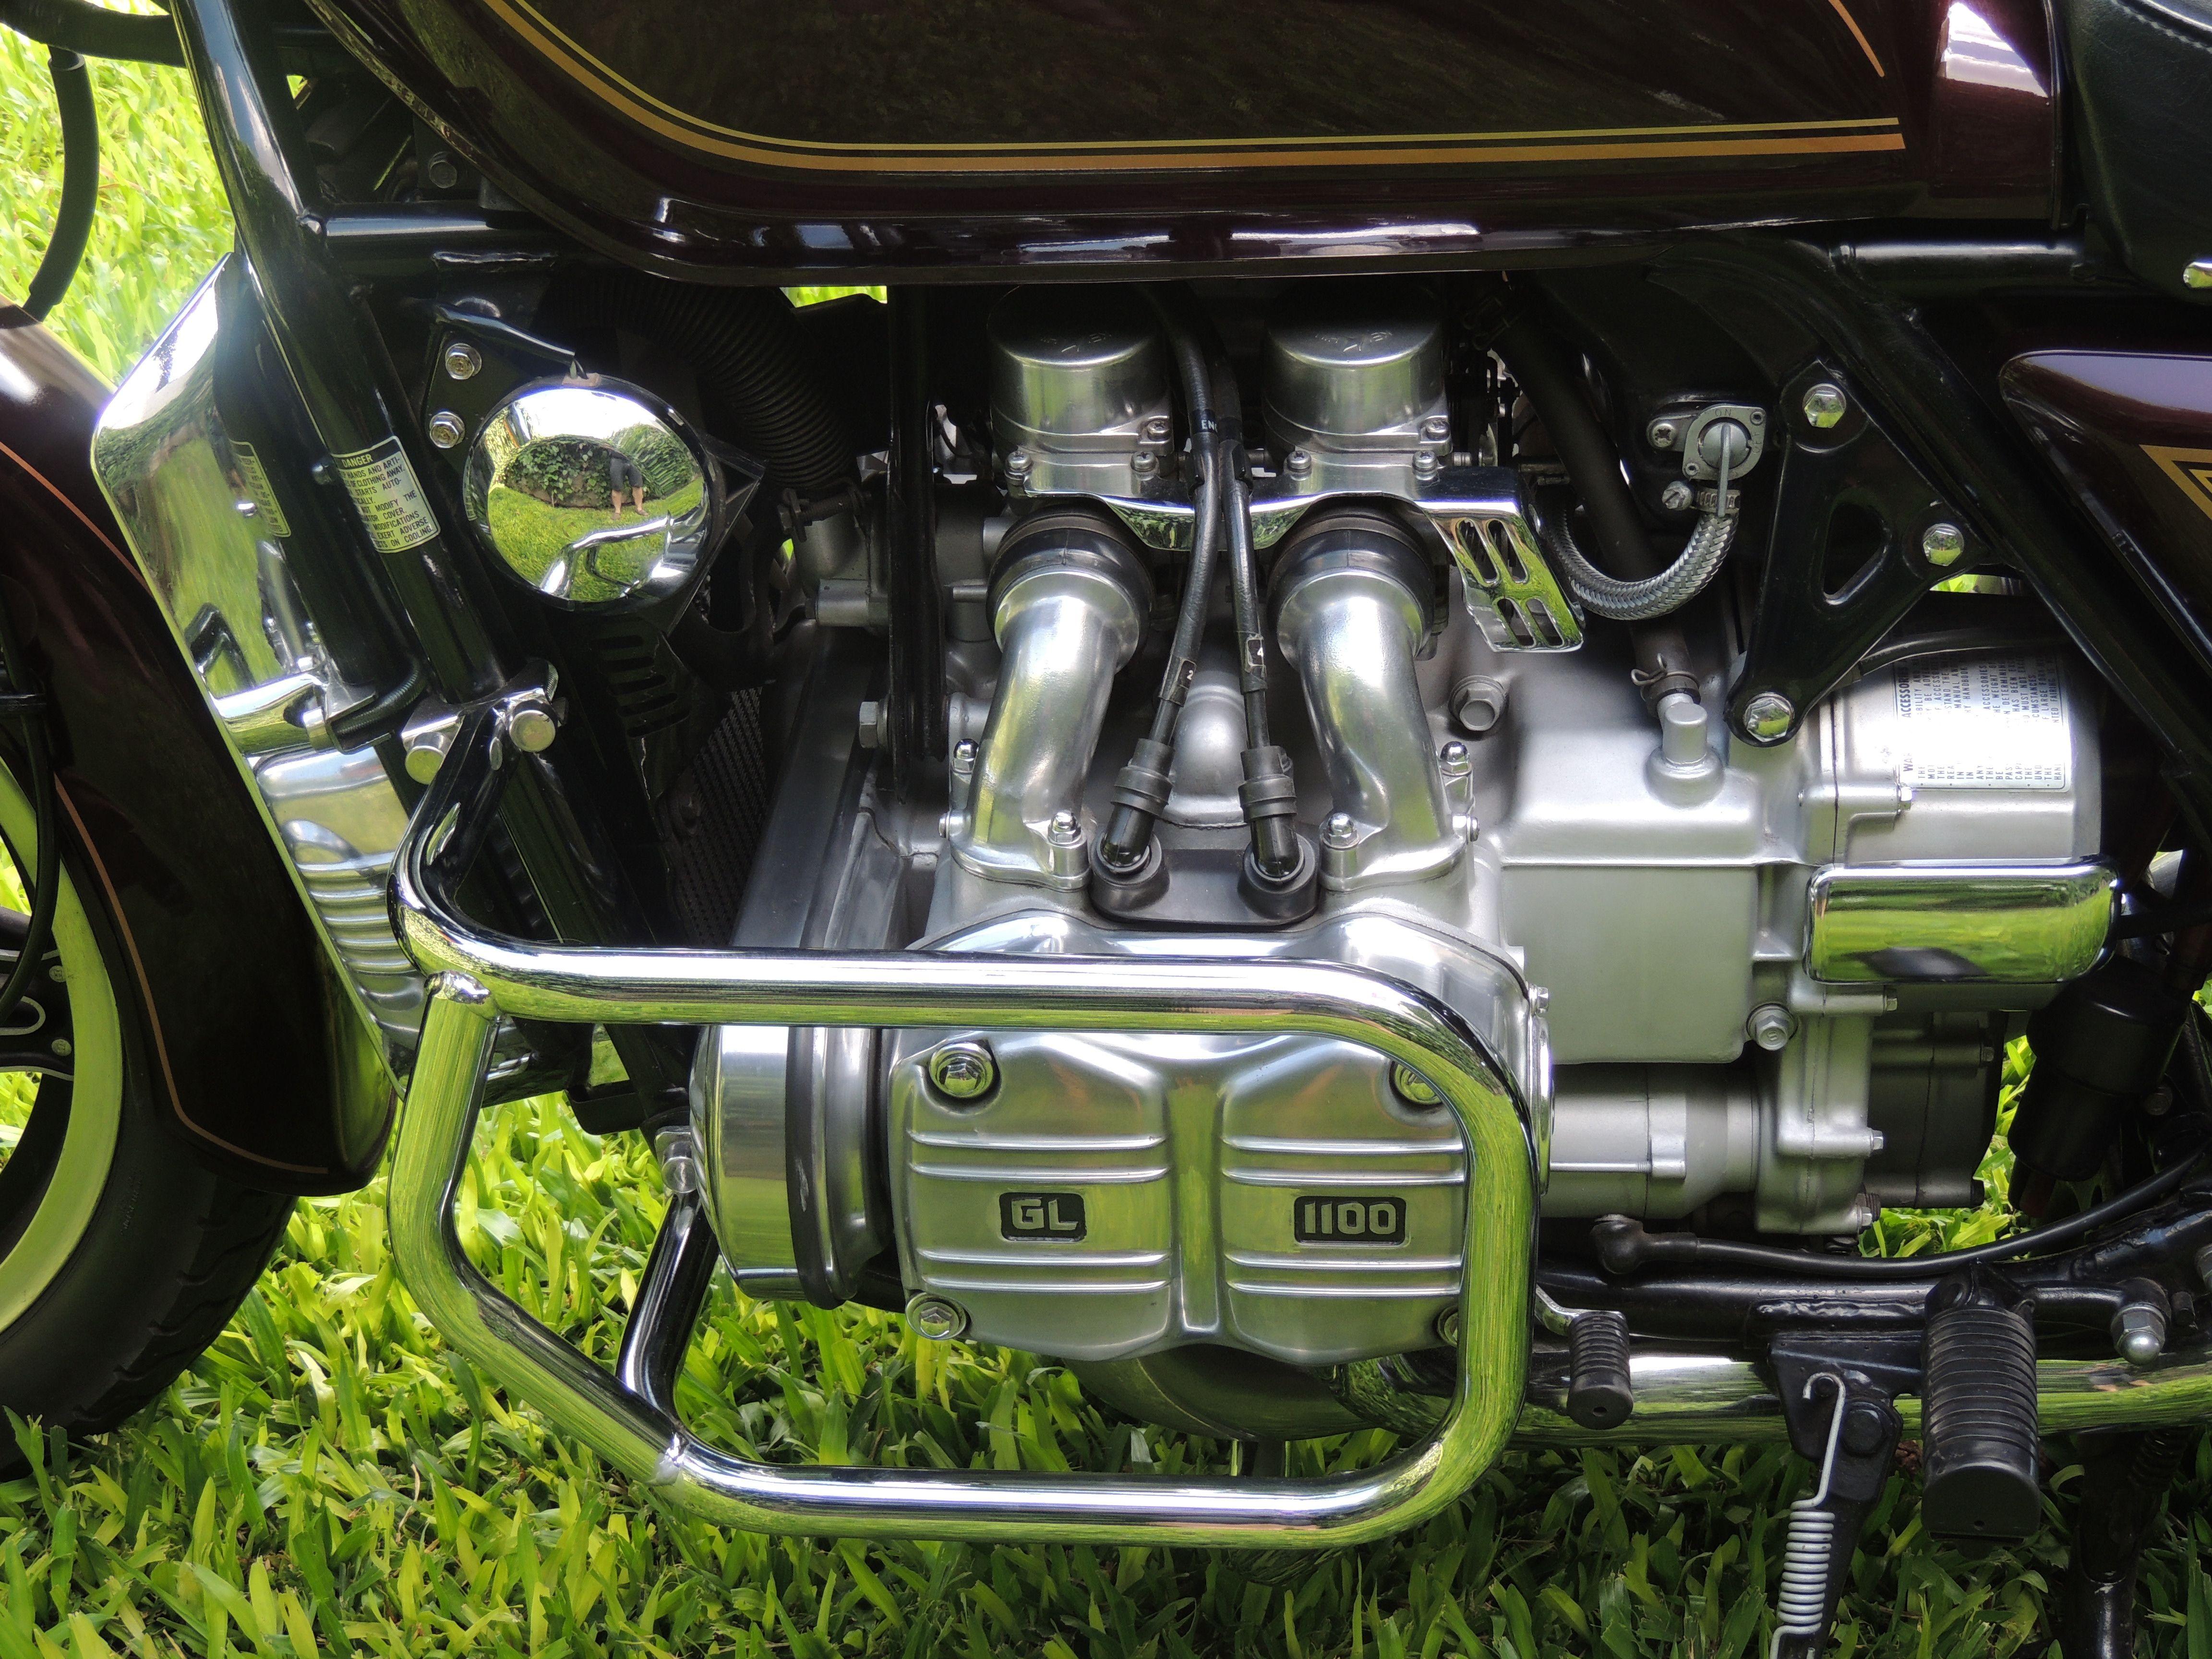 Pin de Mac Cuesta en Honda GOLDWING GL 1100 en 2020